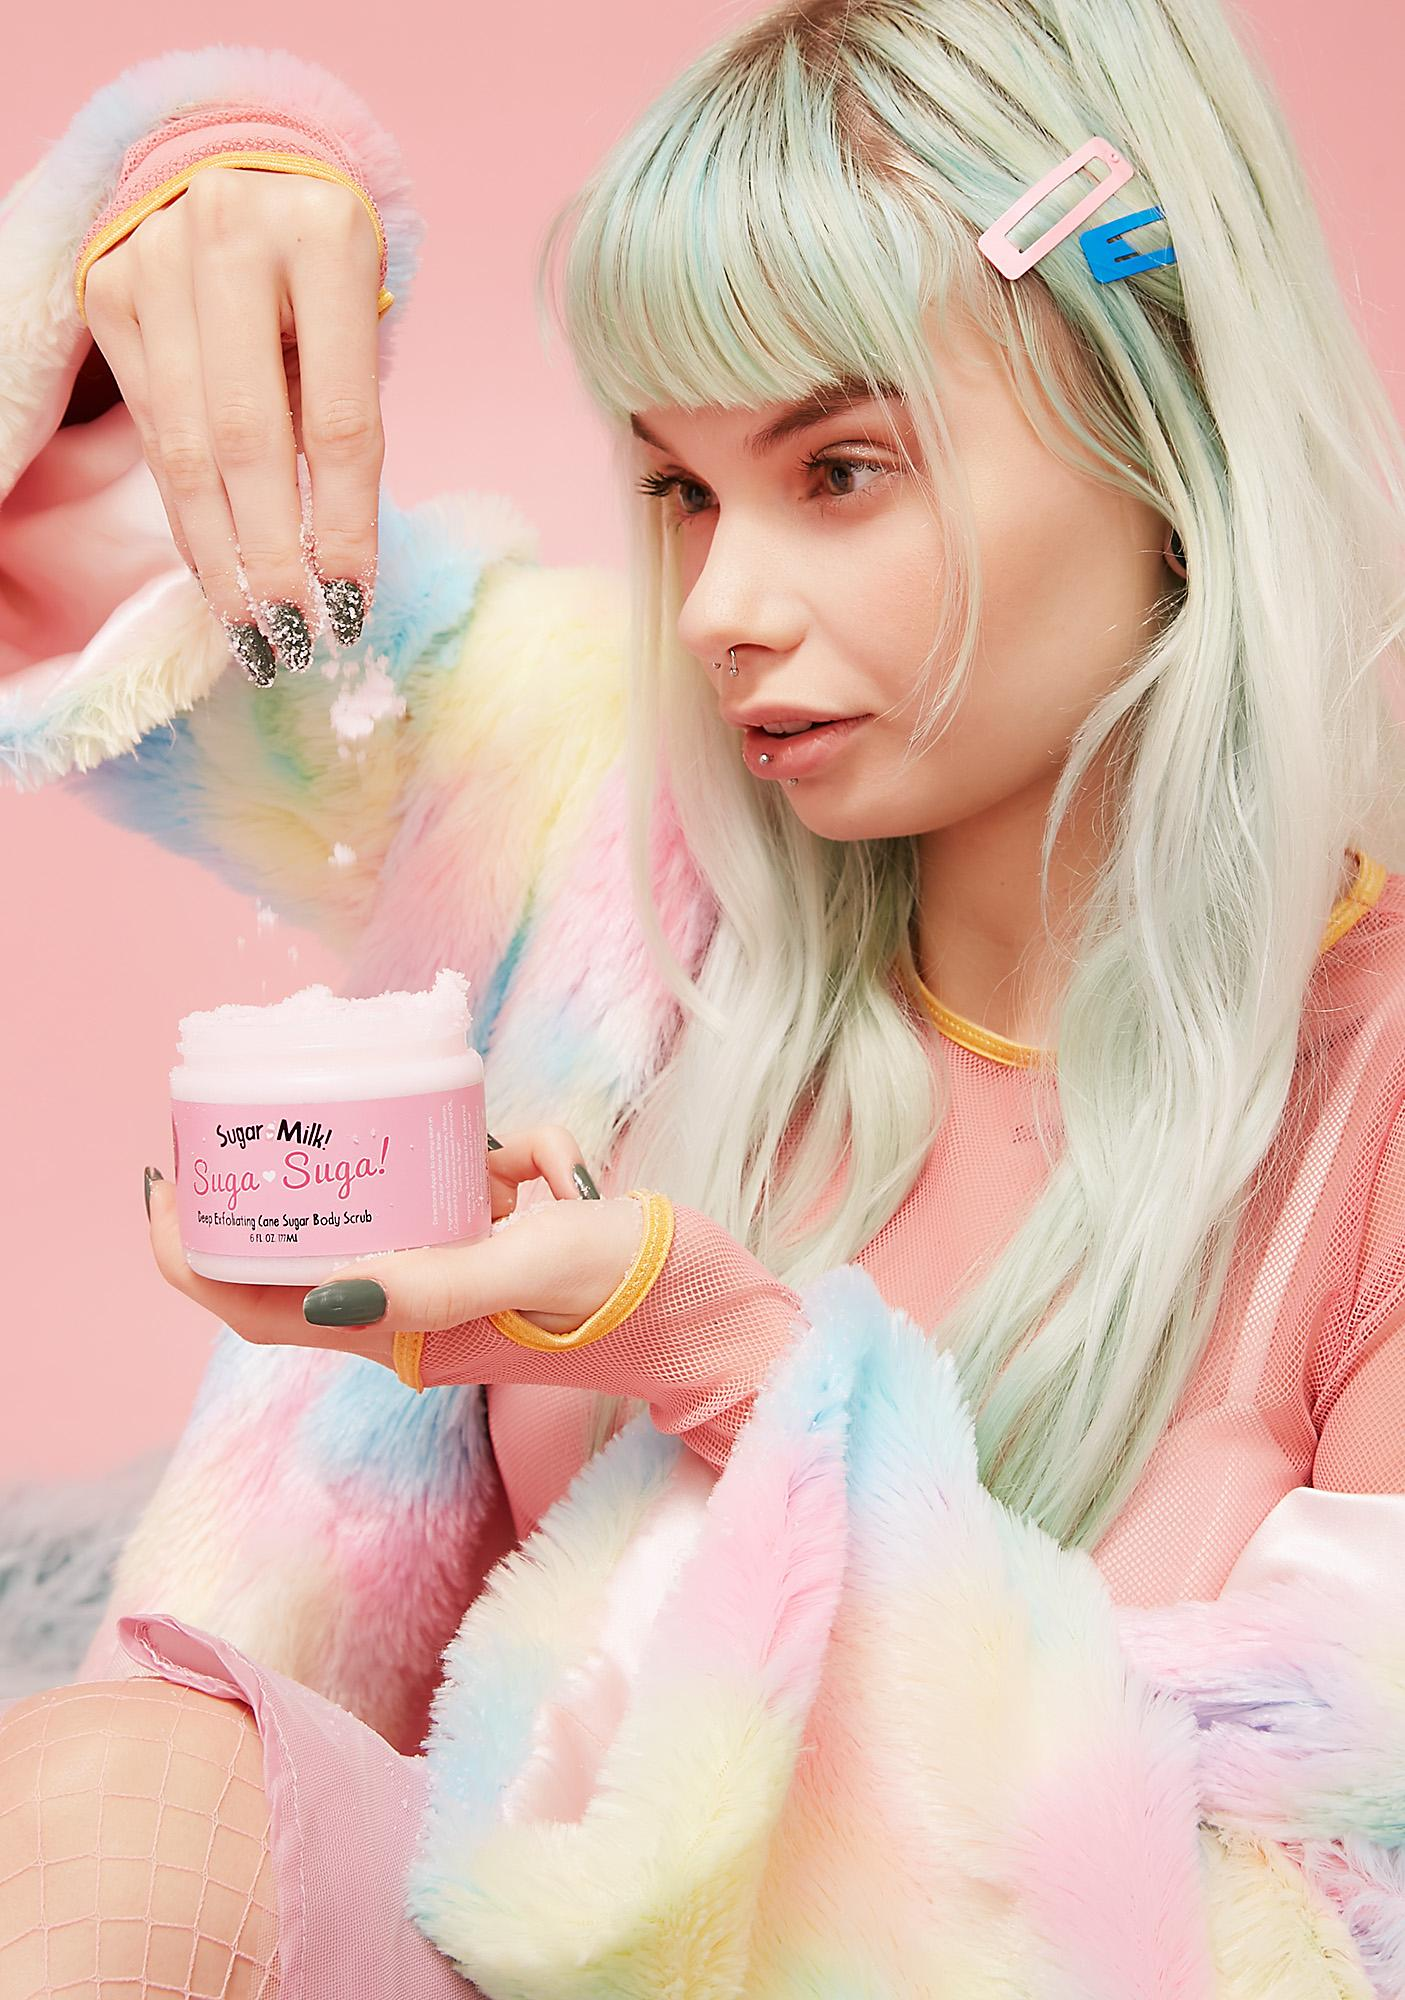 Sugar Milk Co Bubblegum Suga Suga Body Scrub